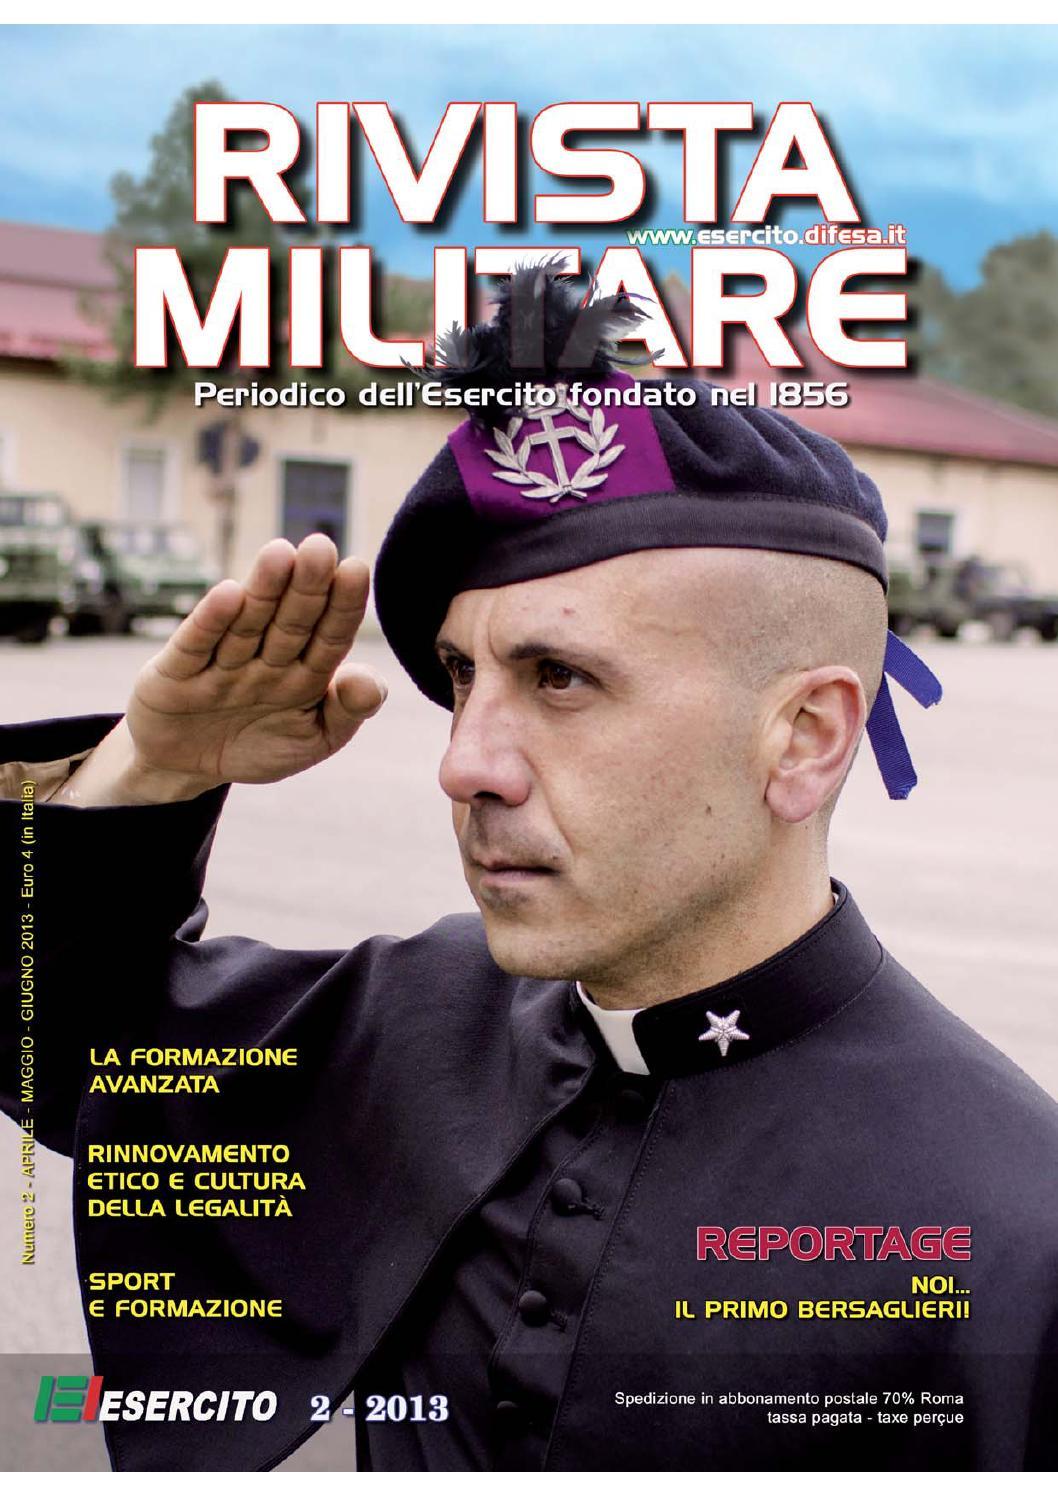 RIVISTA MILITARE 2013 N.2 by Biblioteca Militare - issuu ae9c233f7aa2